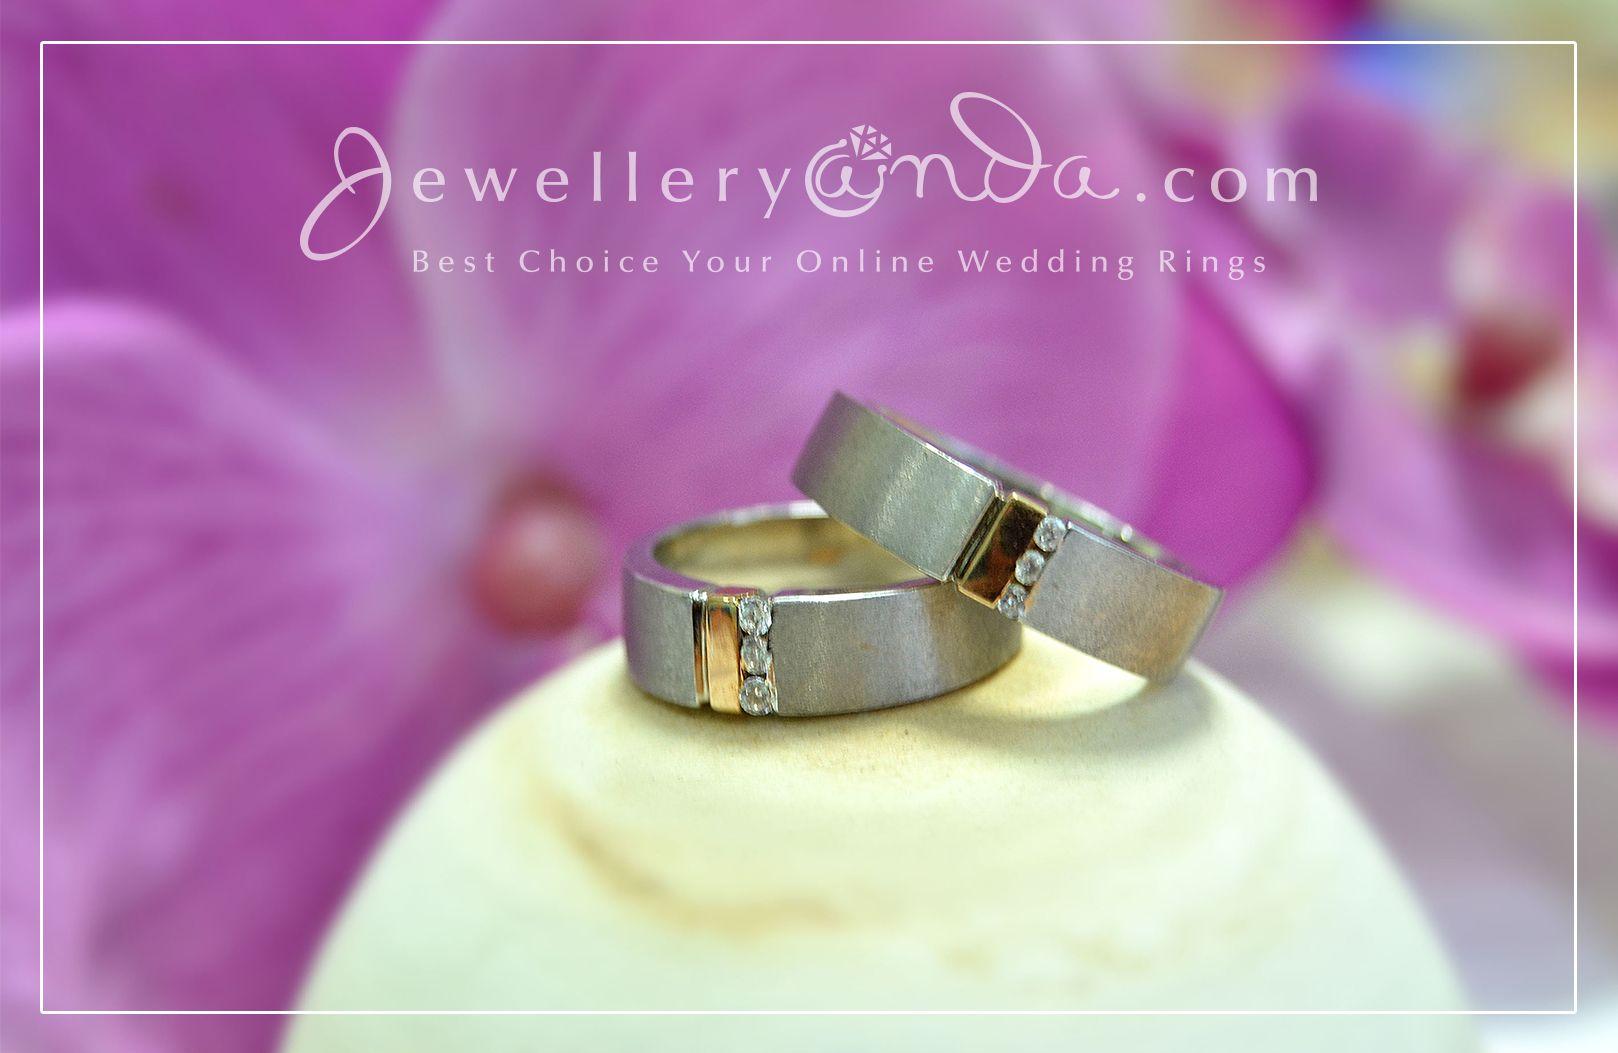 the best online wedding ring